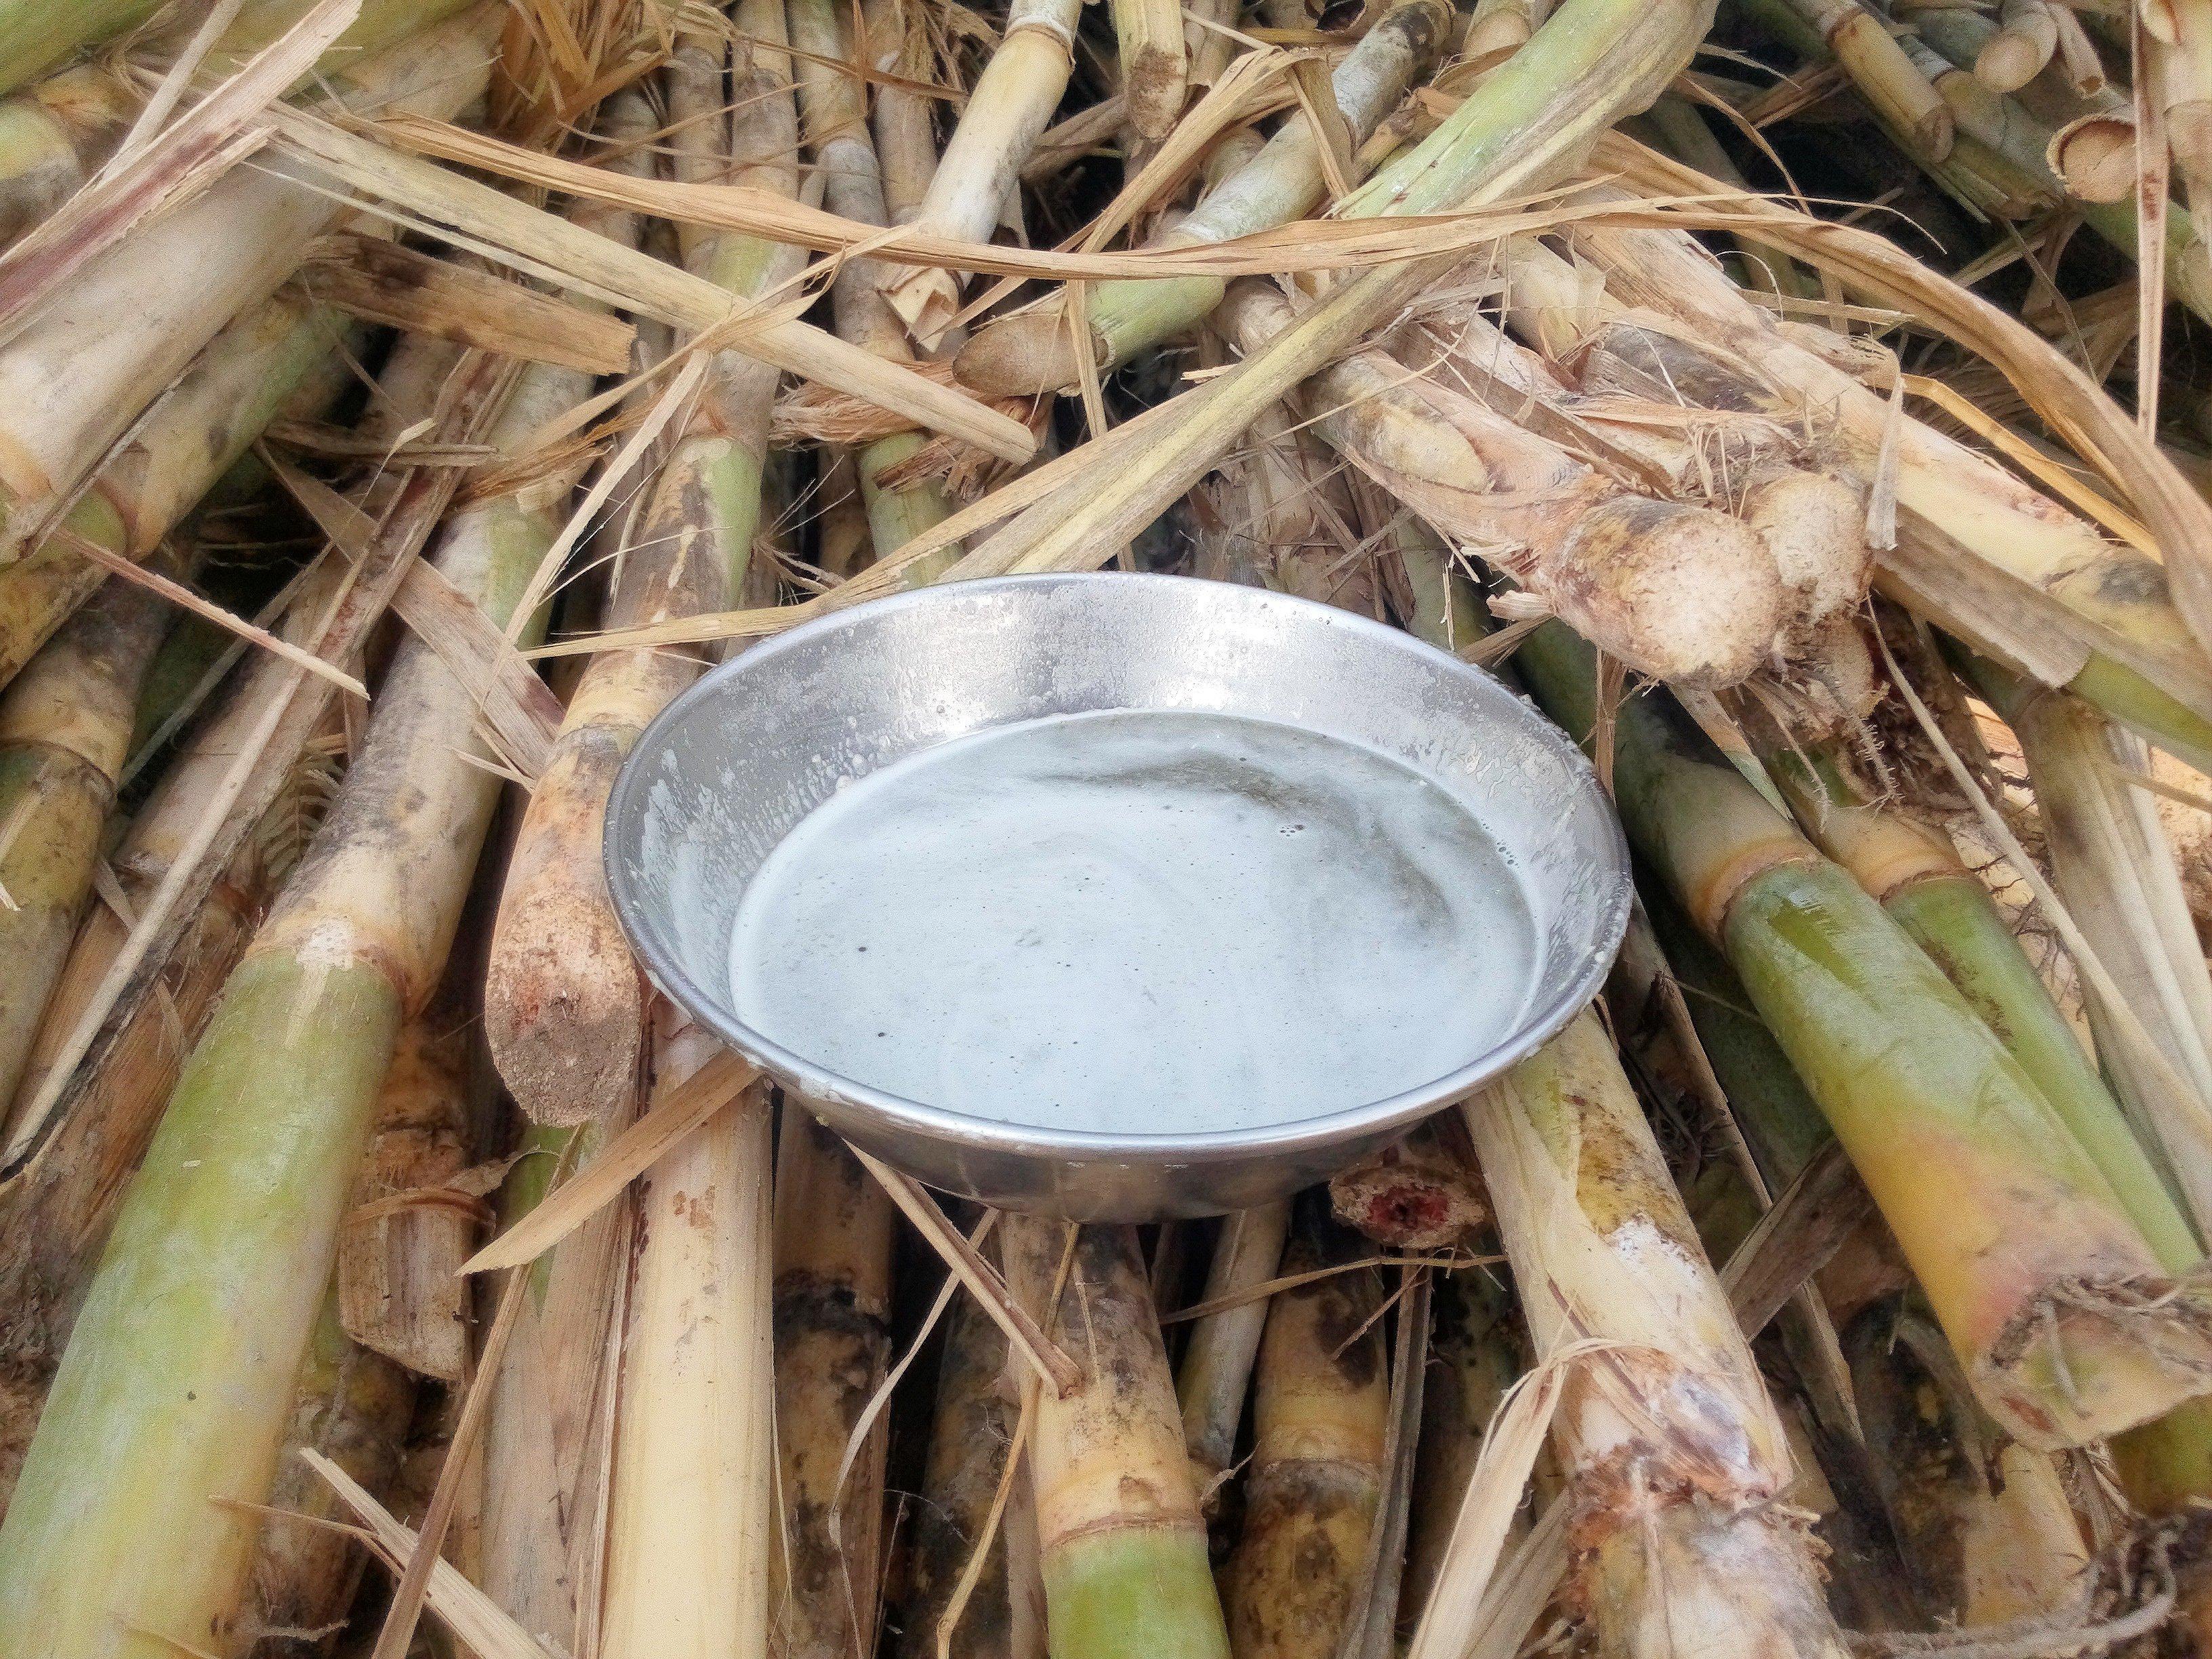 Sugarcane nectar